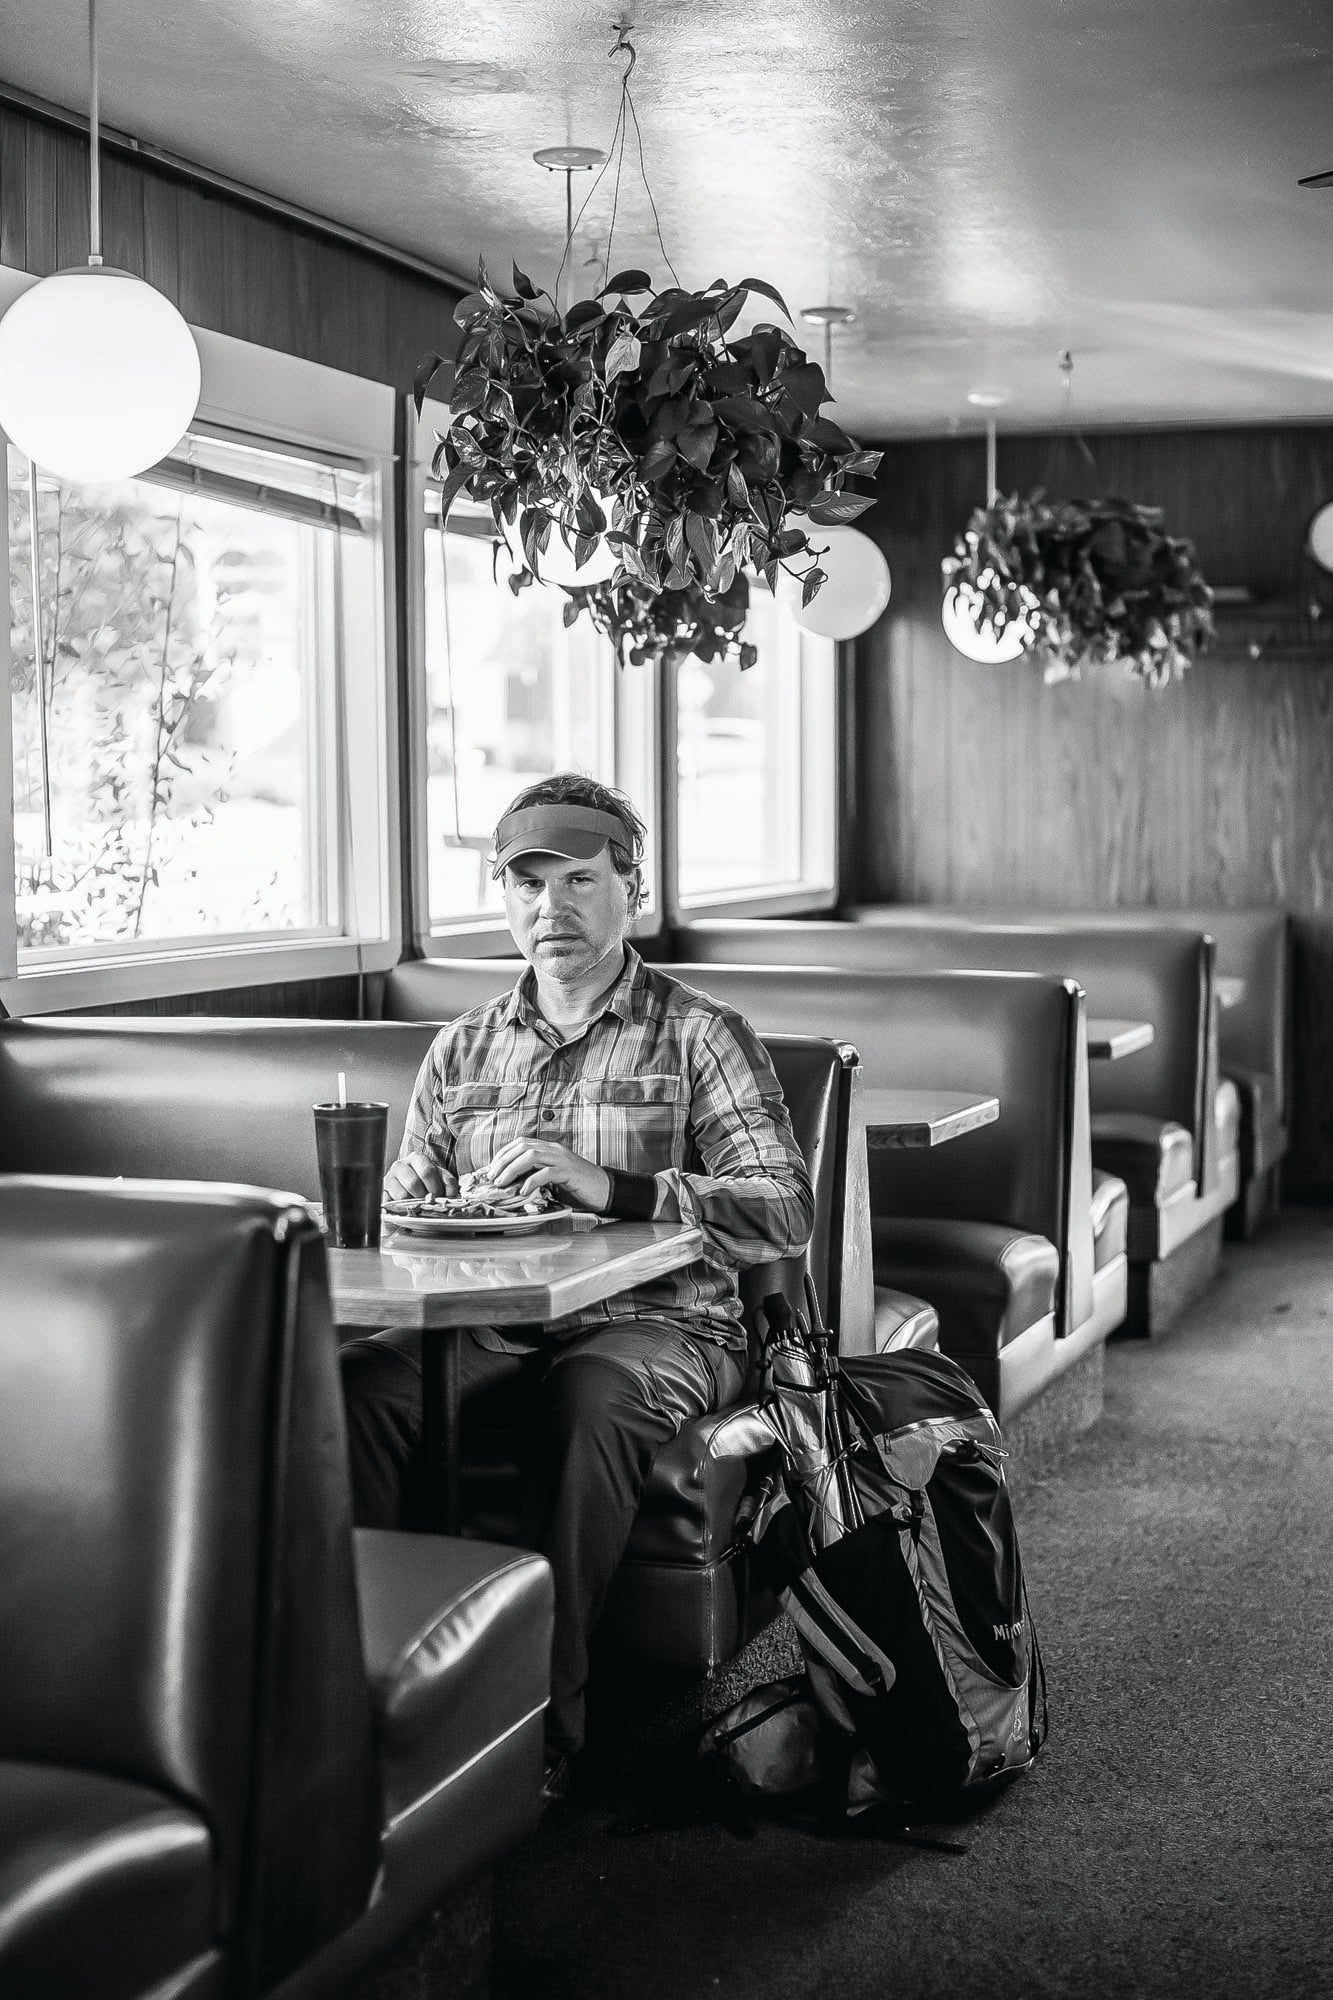 Hiker Rue McKenrick sitting in a diner